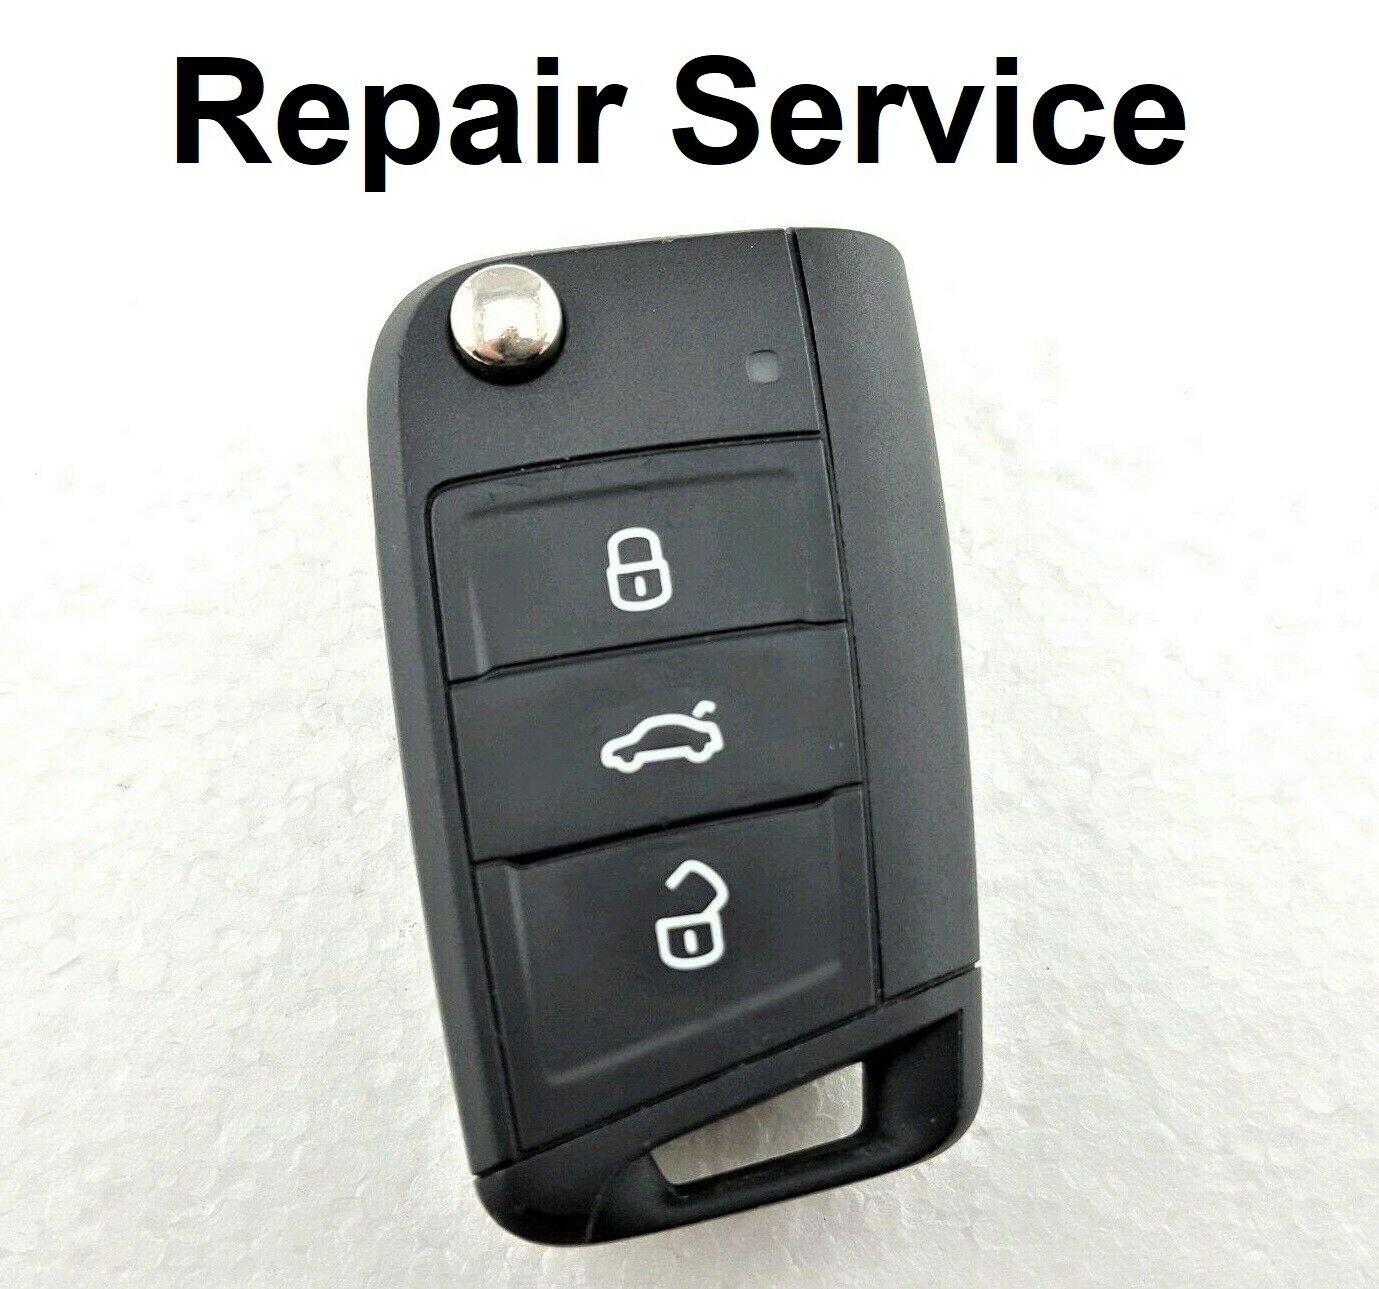 Repair Service for Volkswagen Tiguan Touran Teramont T-Roc Golf Sportsvan 3 Button Remote Key